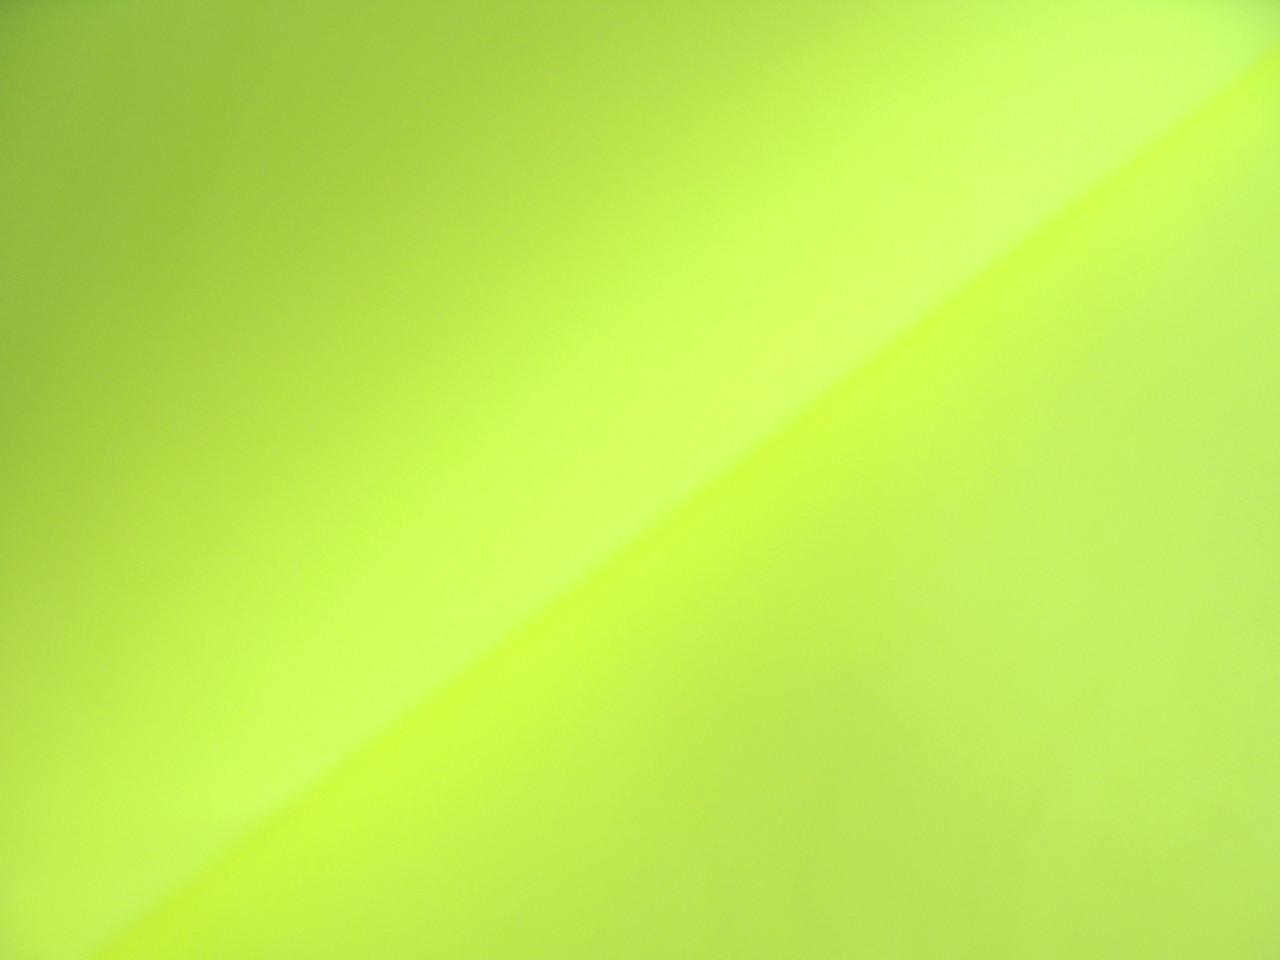 Шелковый Фоамиран, Желтый 46 на 46 см 0,6-0,8 мм